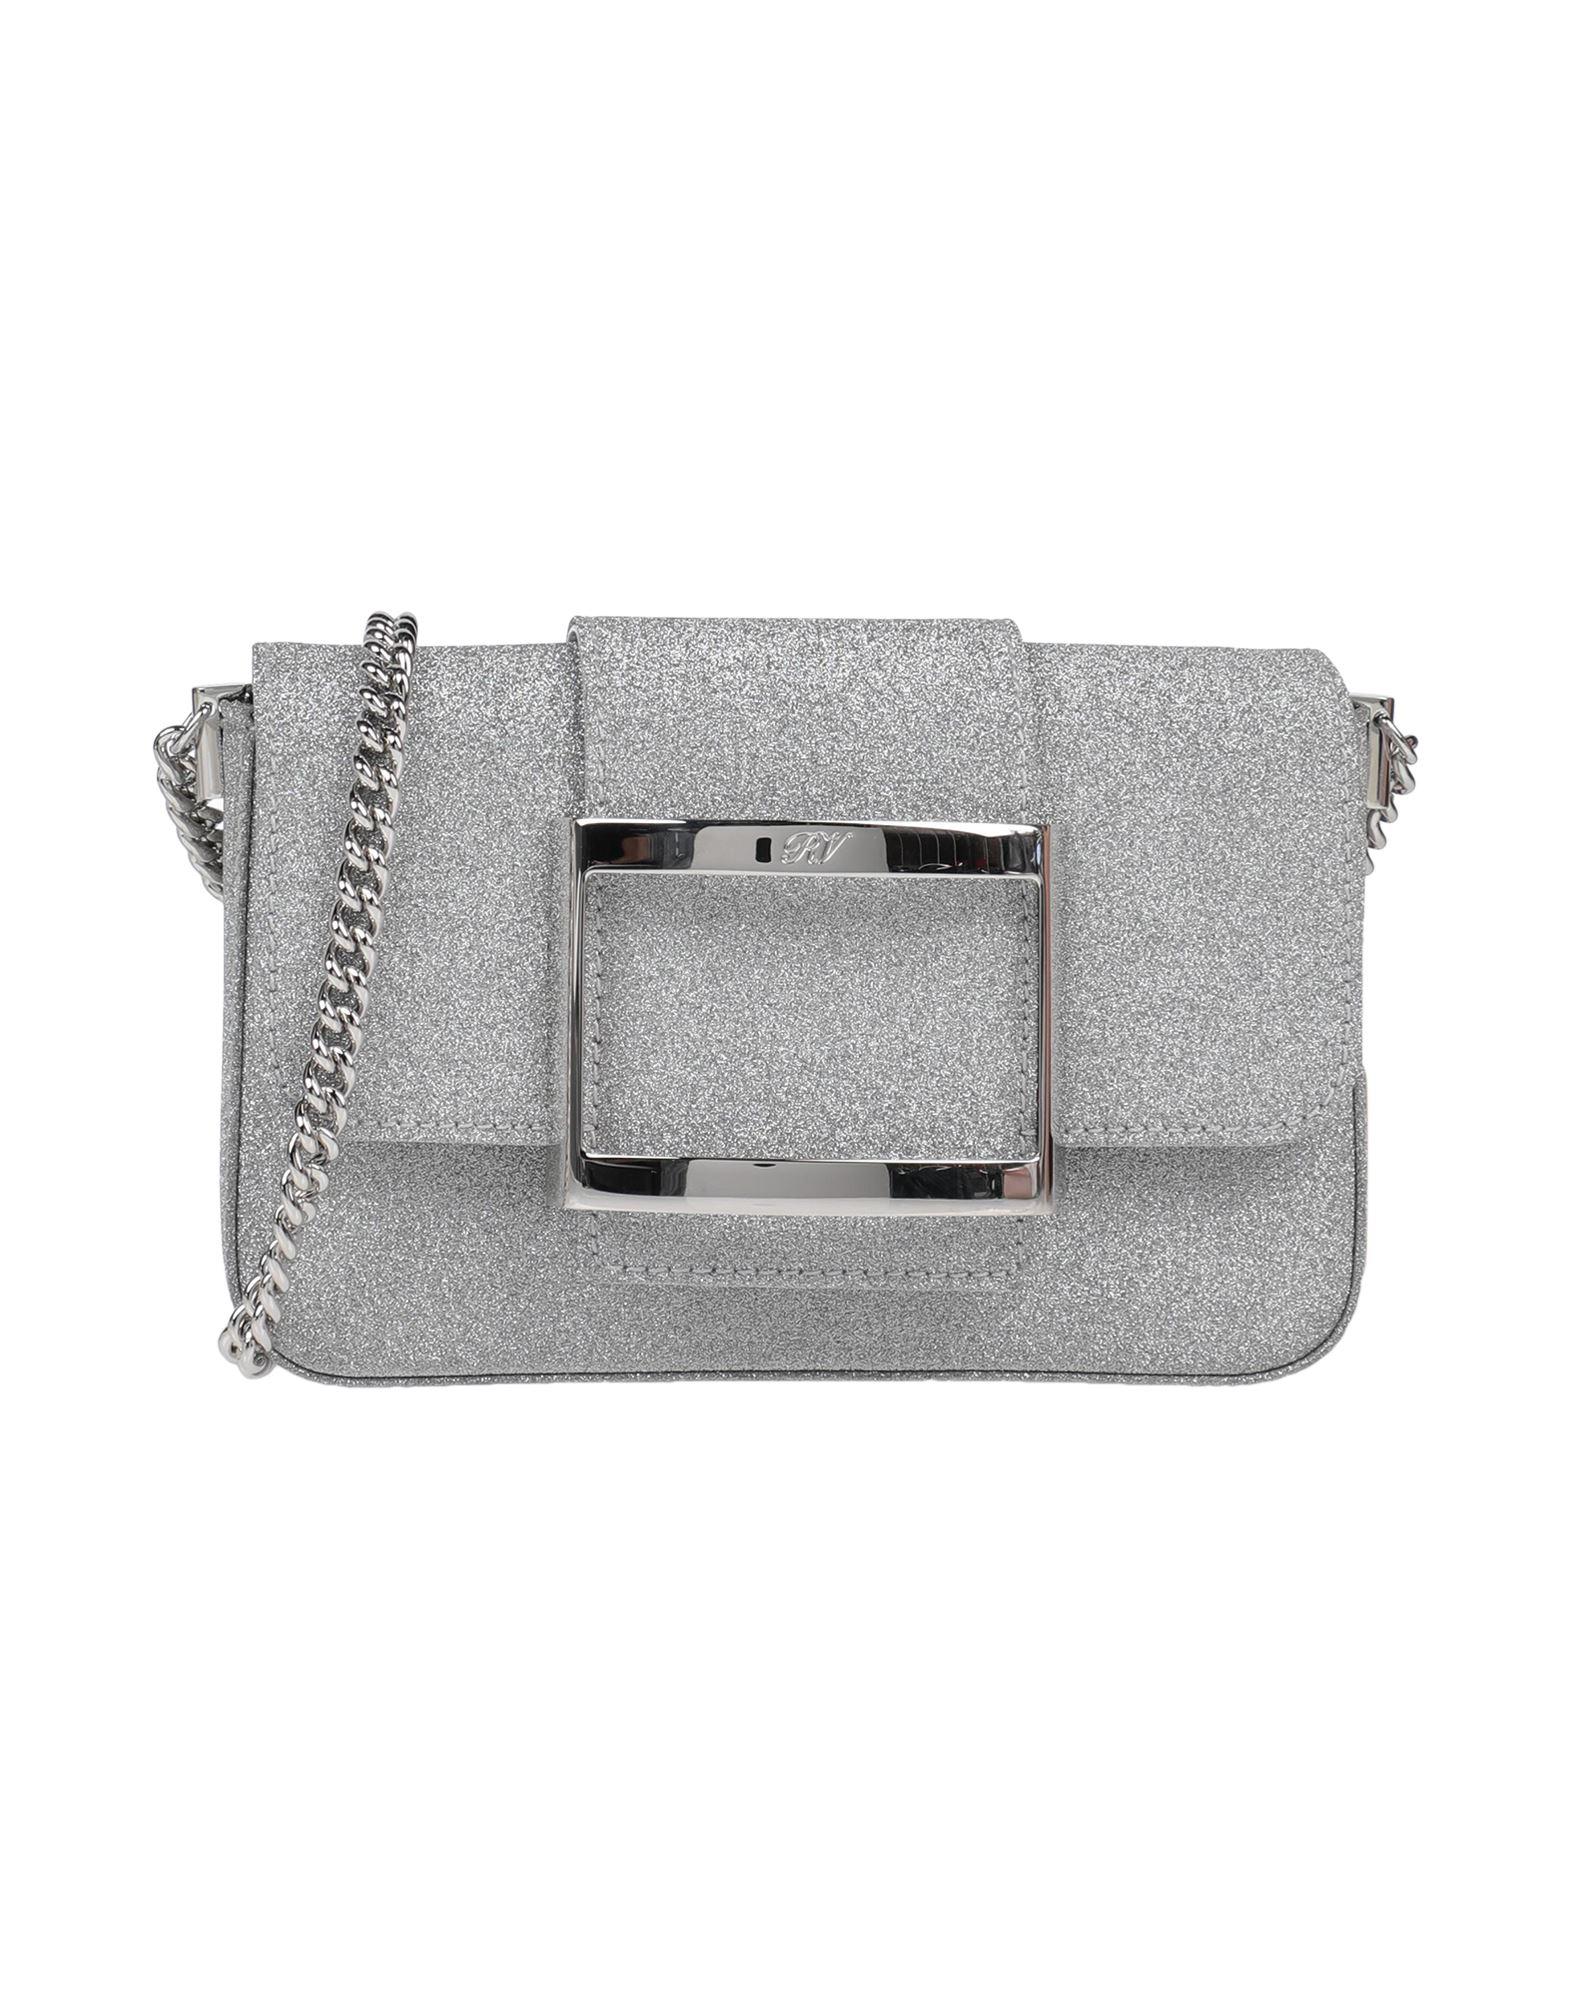 ROGER VIVIER Handbags. glitter, logo, mini, solid color, snap buttons fastening, fully lined, stiff bottom. Textile fibers